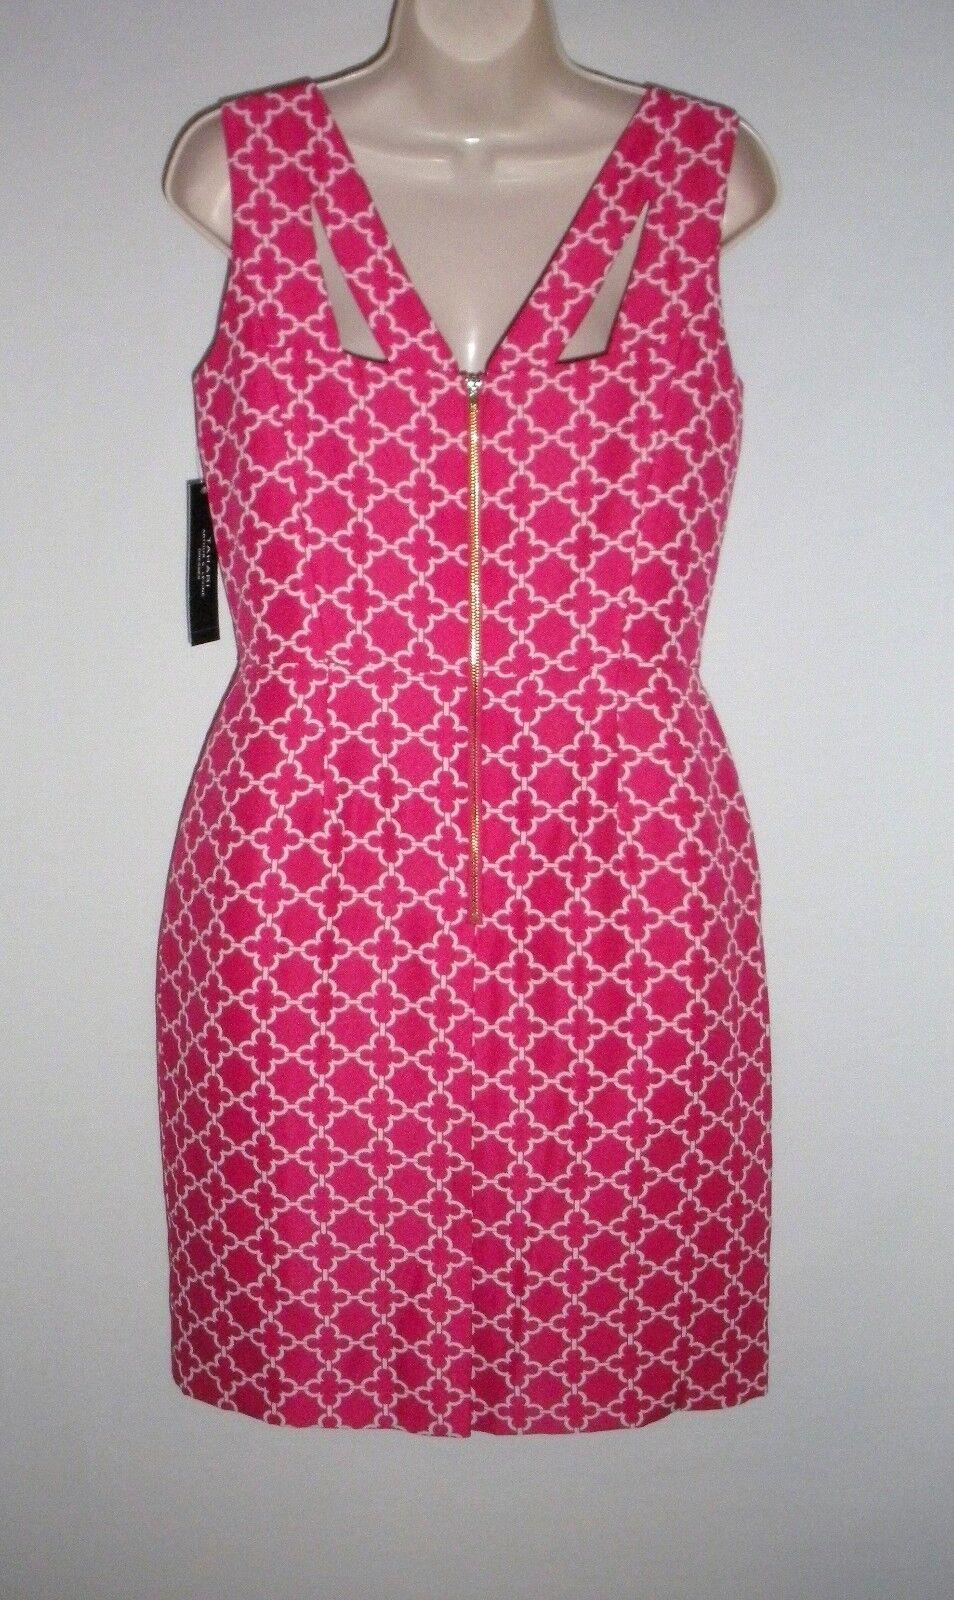 NWT MSRP MSRP MSRP  128 - TAHARI by ASL Geometric Print Sheath Dress, Strawberry 76337e